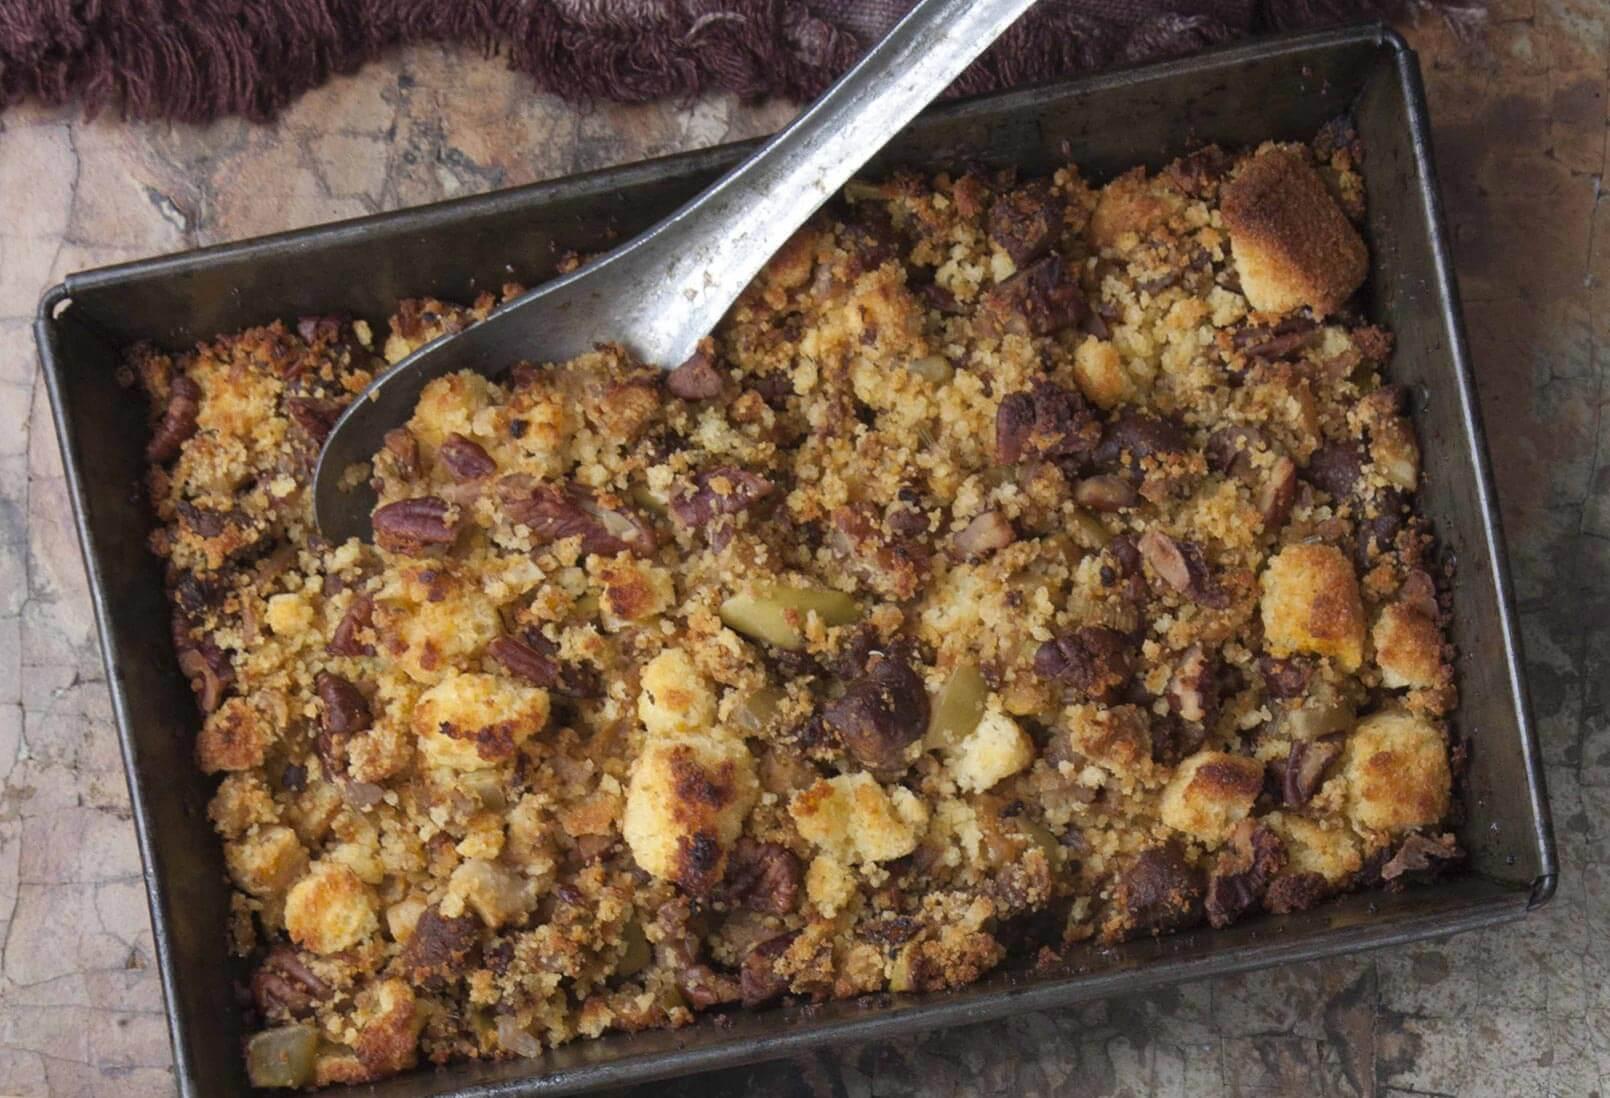 Pati Jinich relleno de chorizo manzana y pan de elote